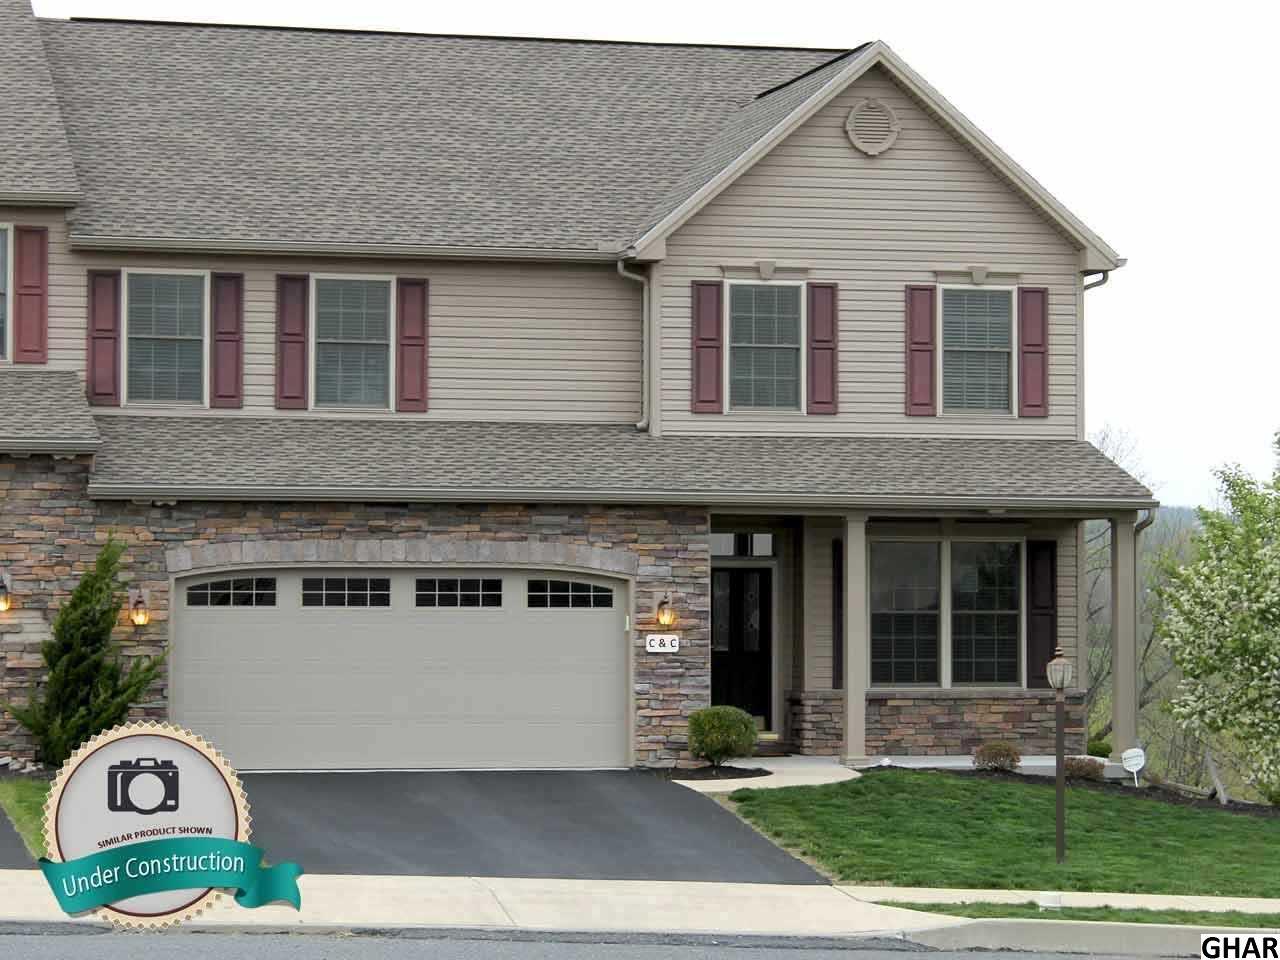 Single Family Home for Sale, ListingId:33918455, location: 4303 N Victoria Way Harrisburg 17112